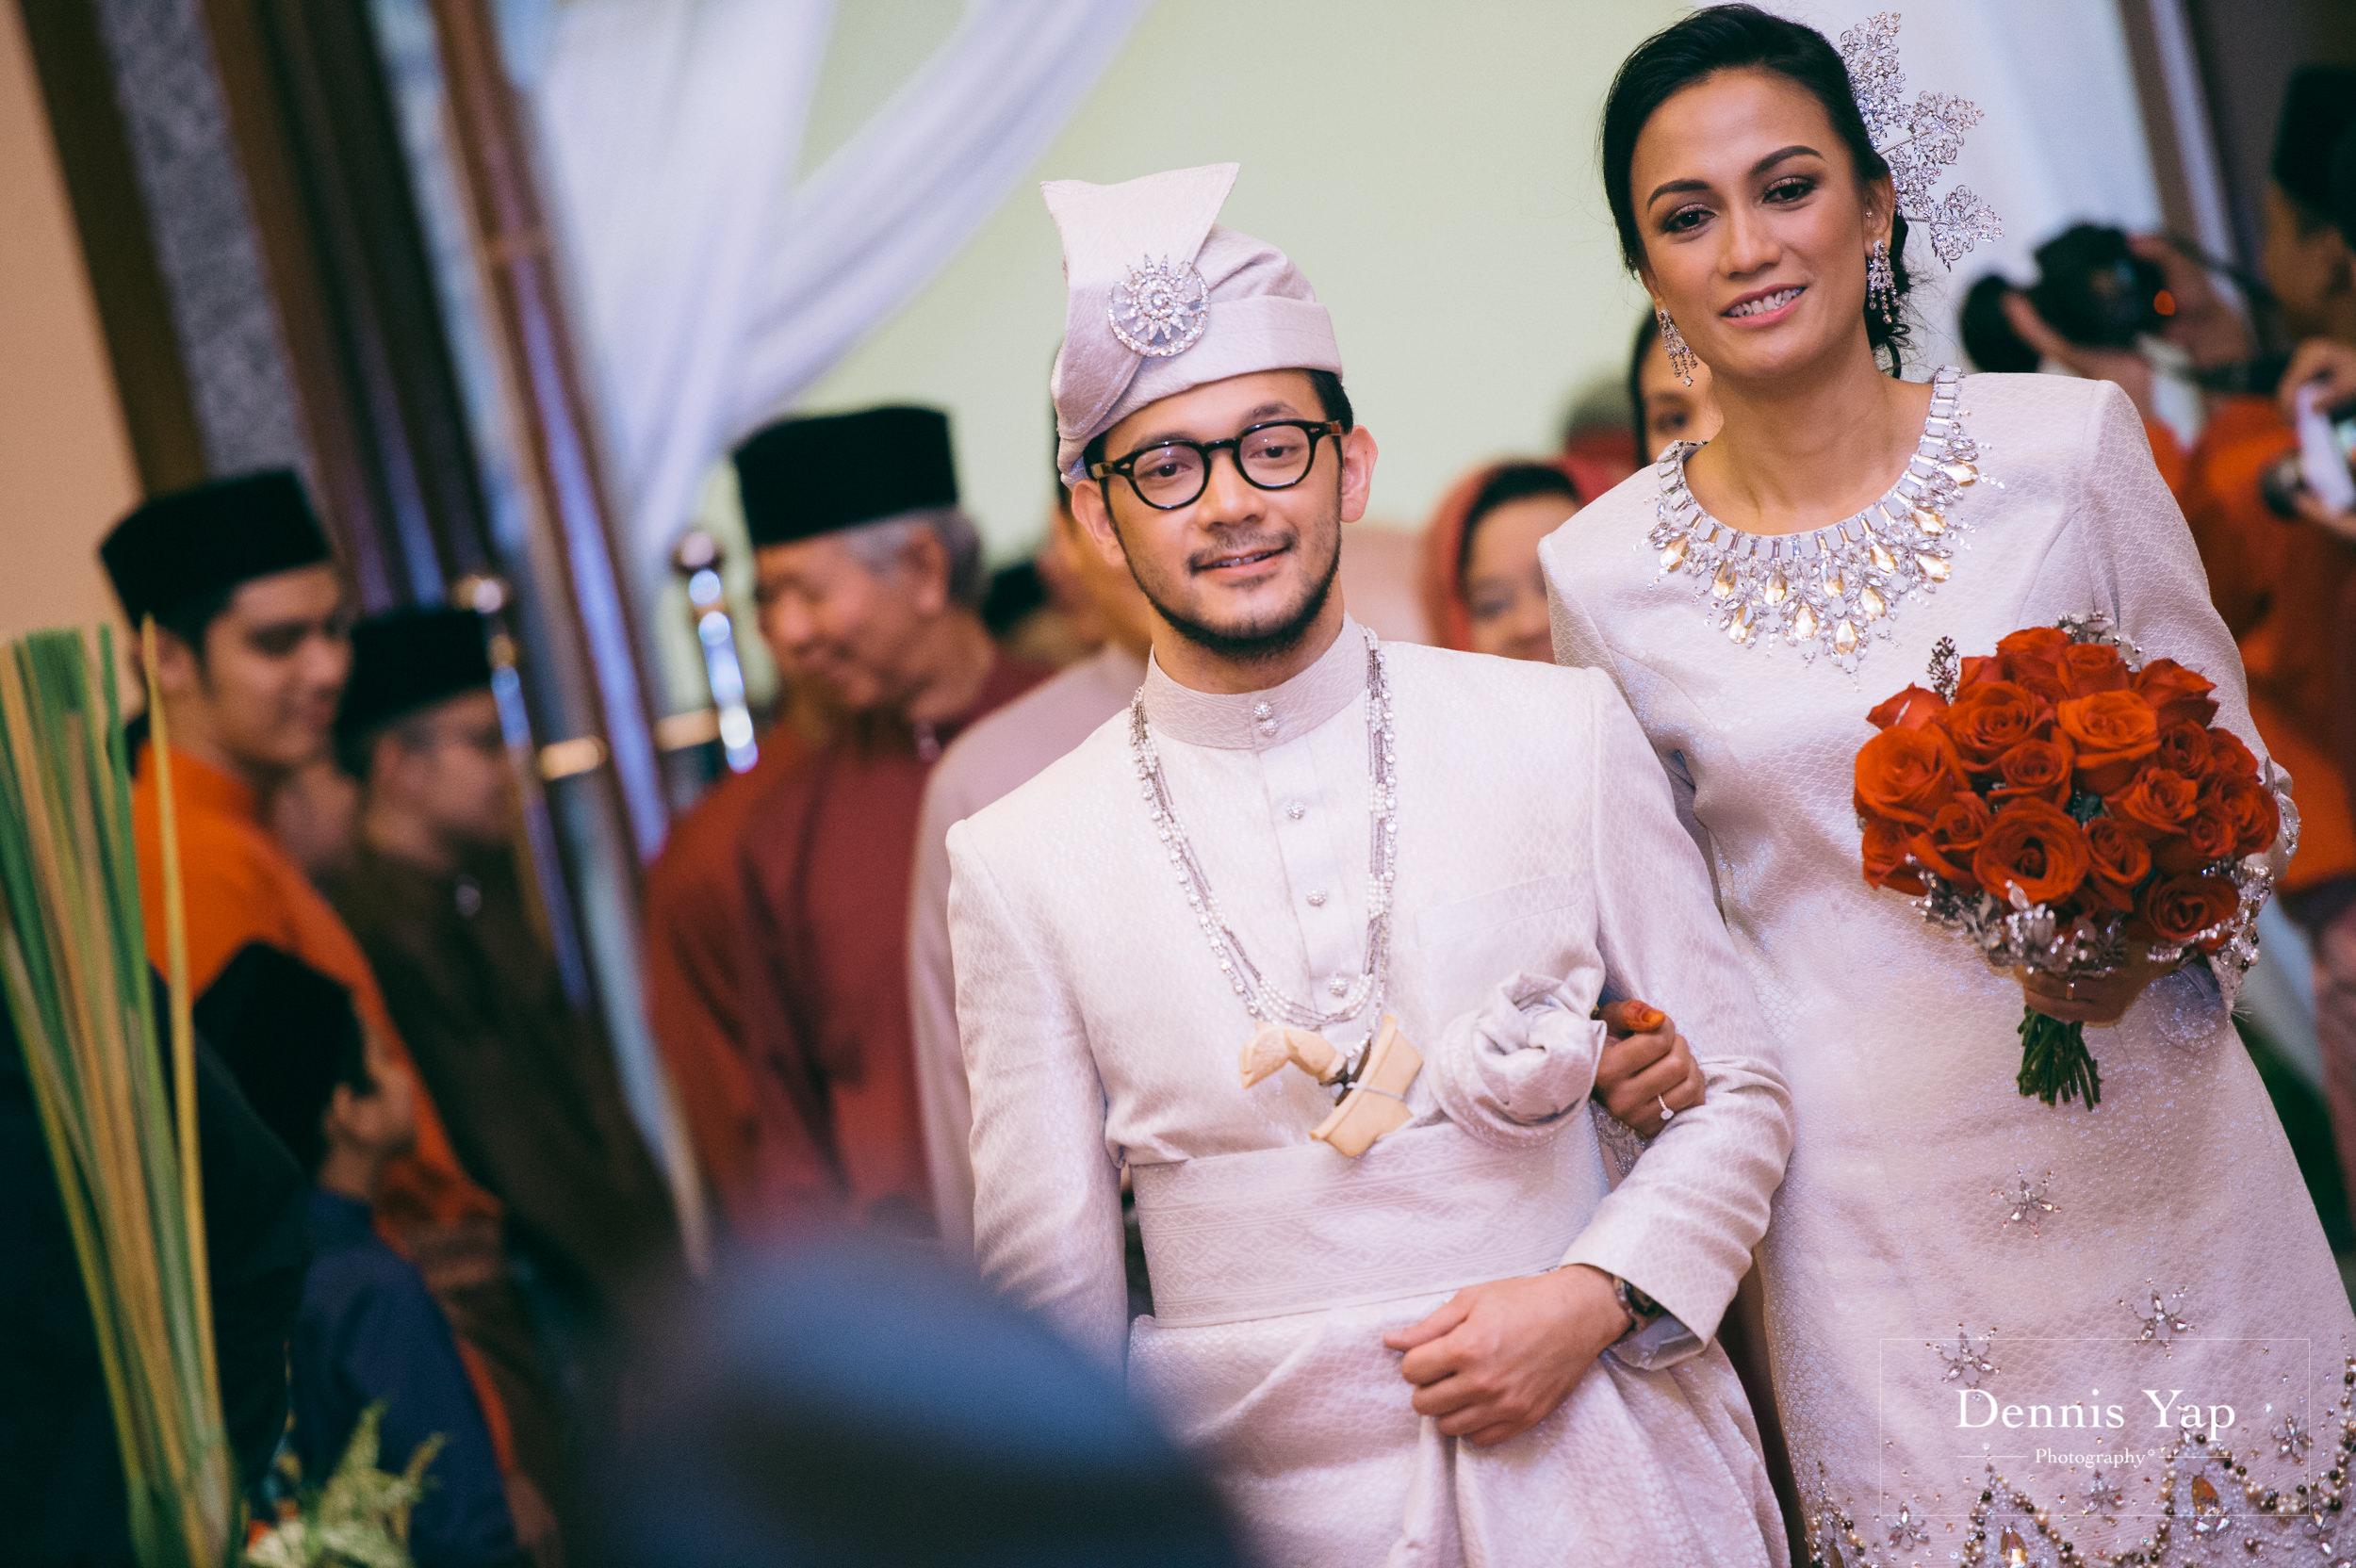 zarif hanalili malay wedding blessing ceremony dennis yap photography-11.jpg